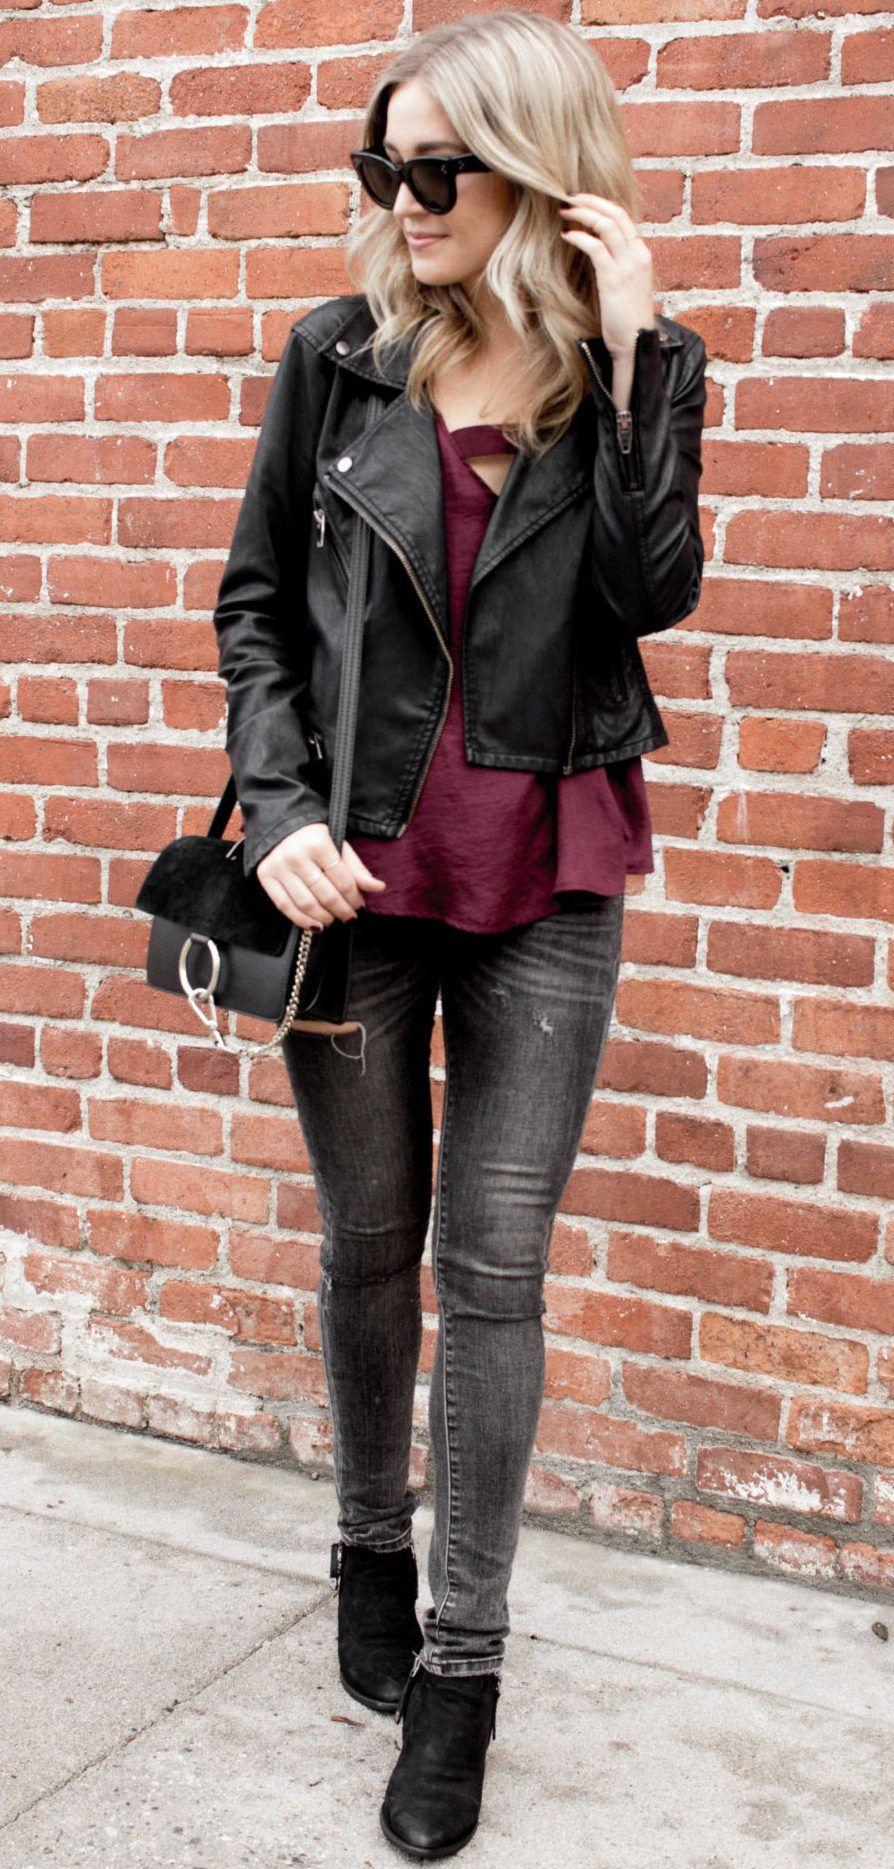 Black Moto Jacket + Burgundy Silk Tank Top